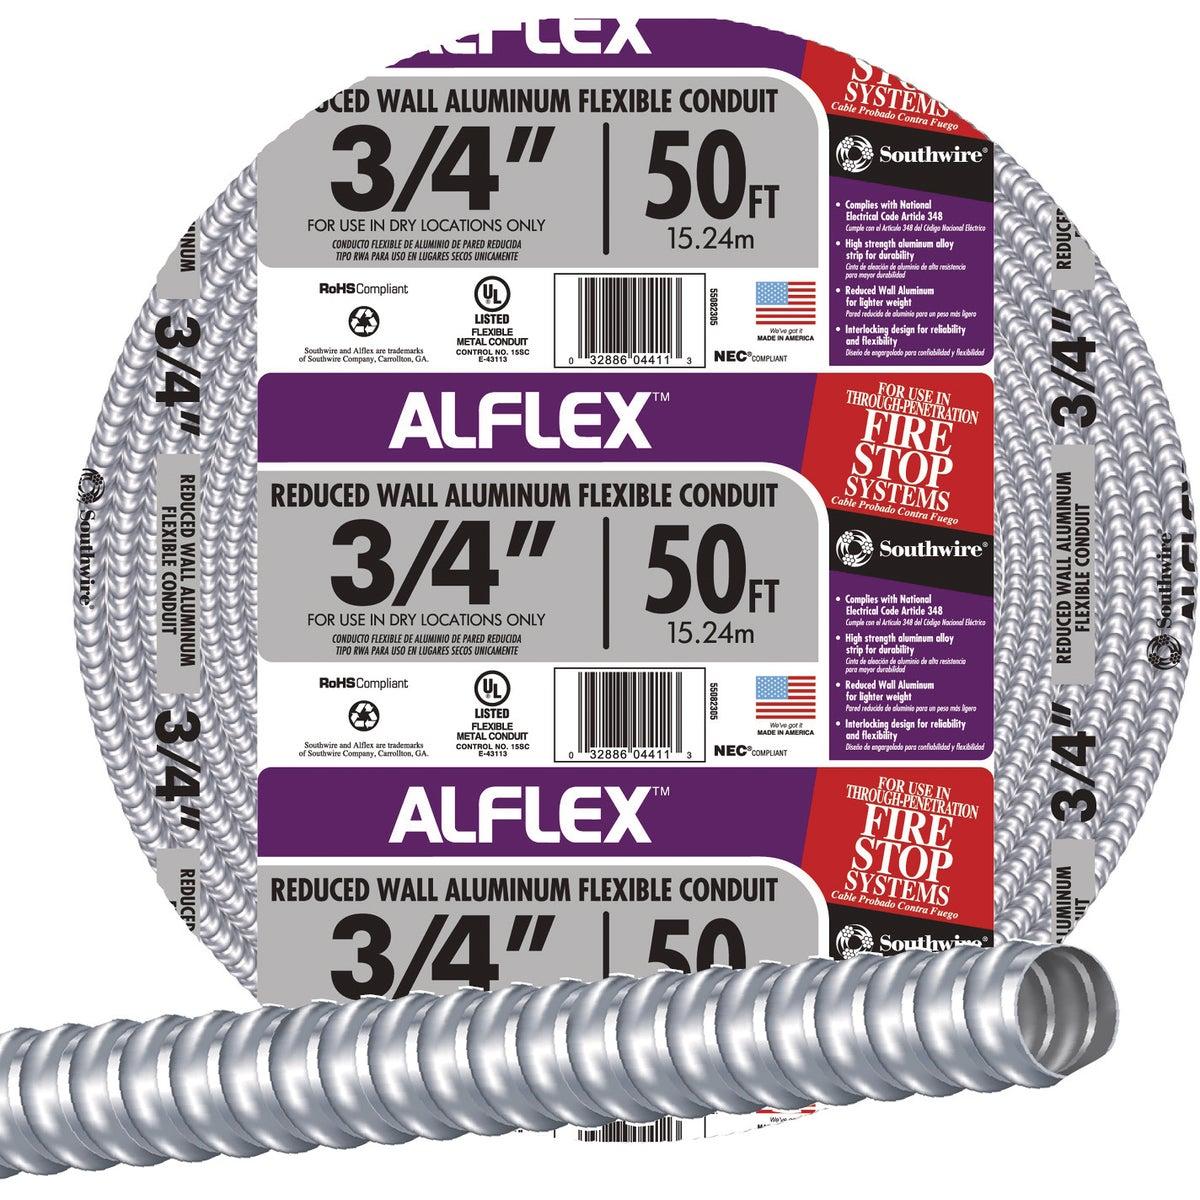 "50' 3/4"" FLEX CONDUIT - 55082305 by Southwire Company"